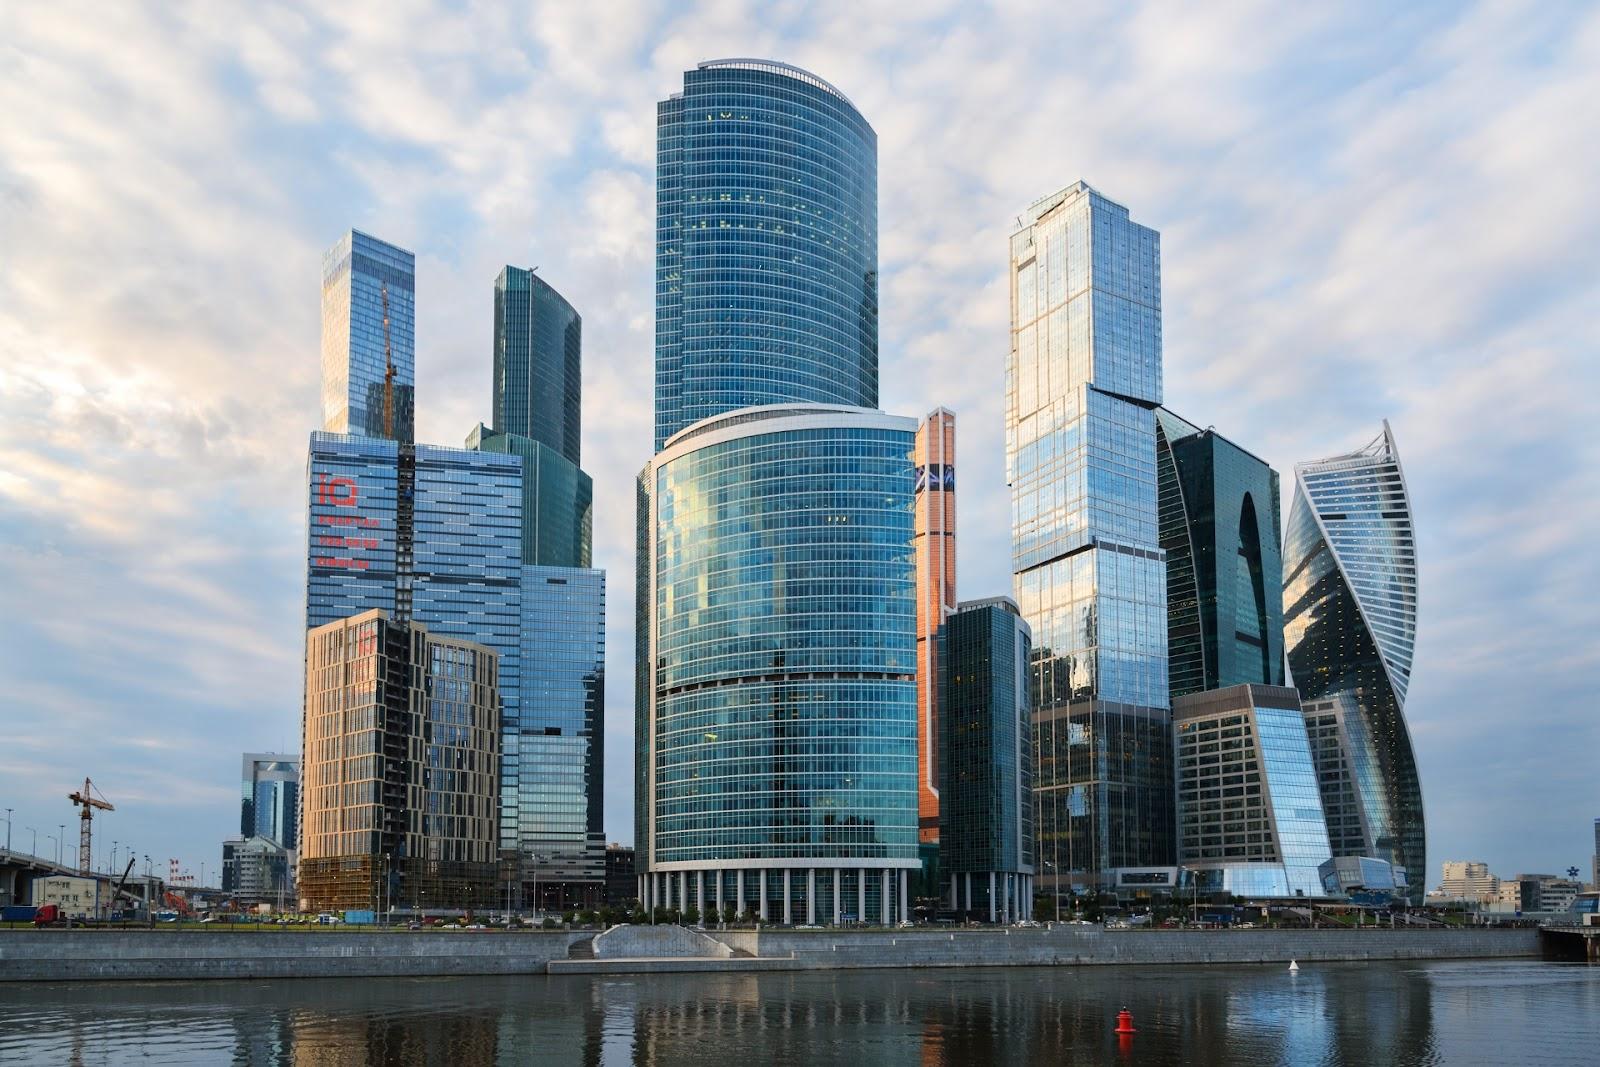 Москва-сити. Фотография.